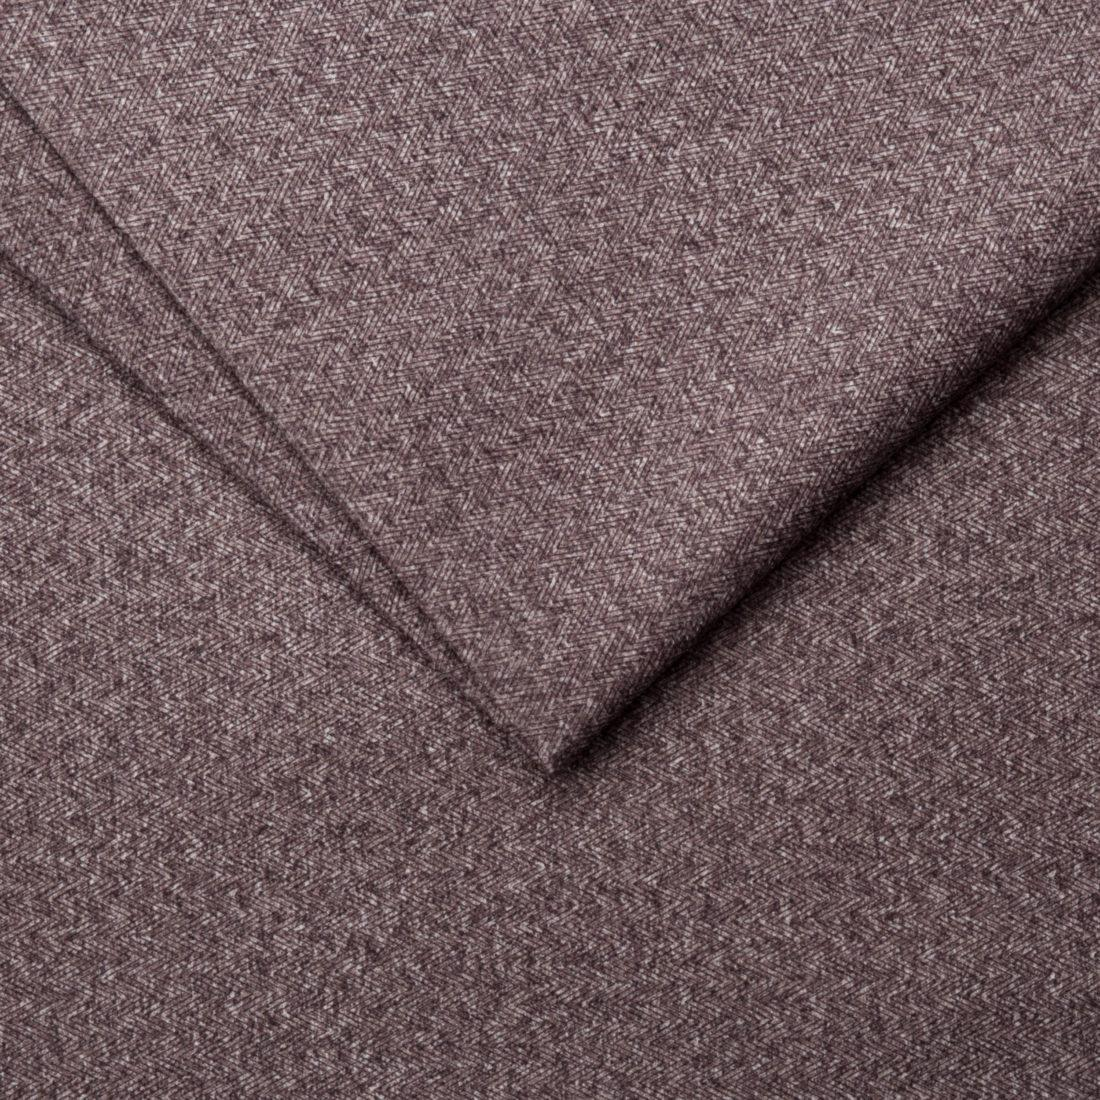 Мебельная ткань Next 4 Mink, велюр